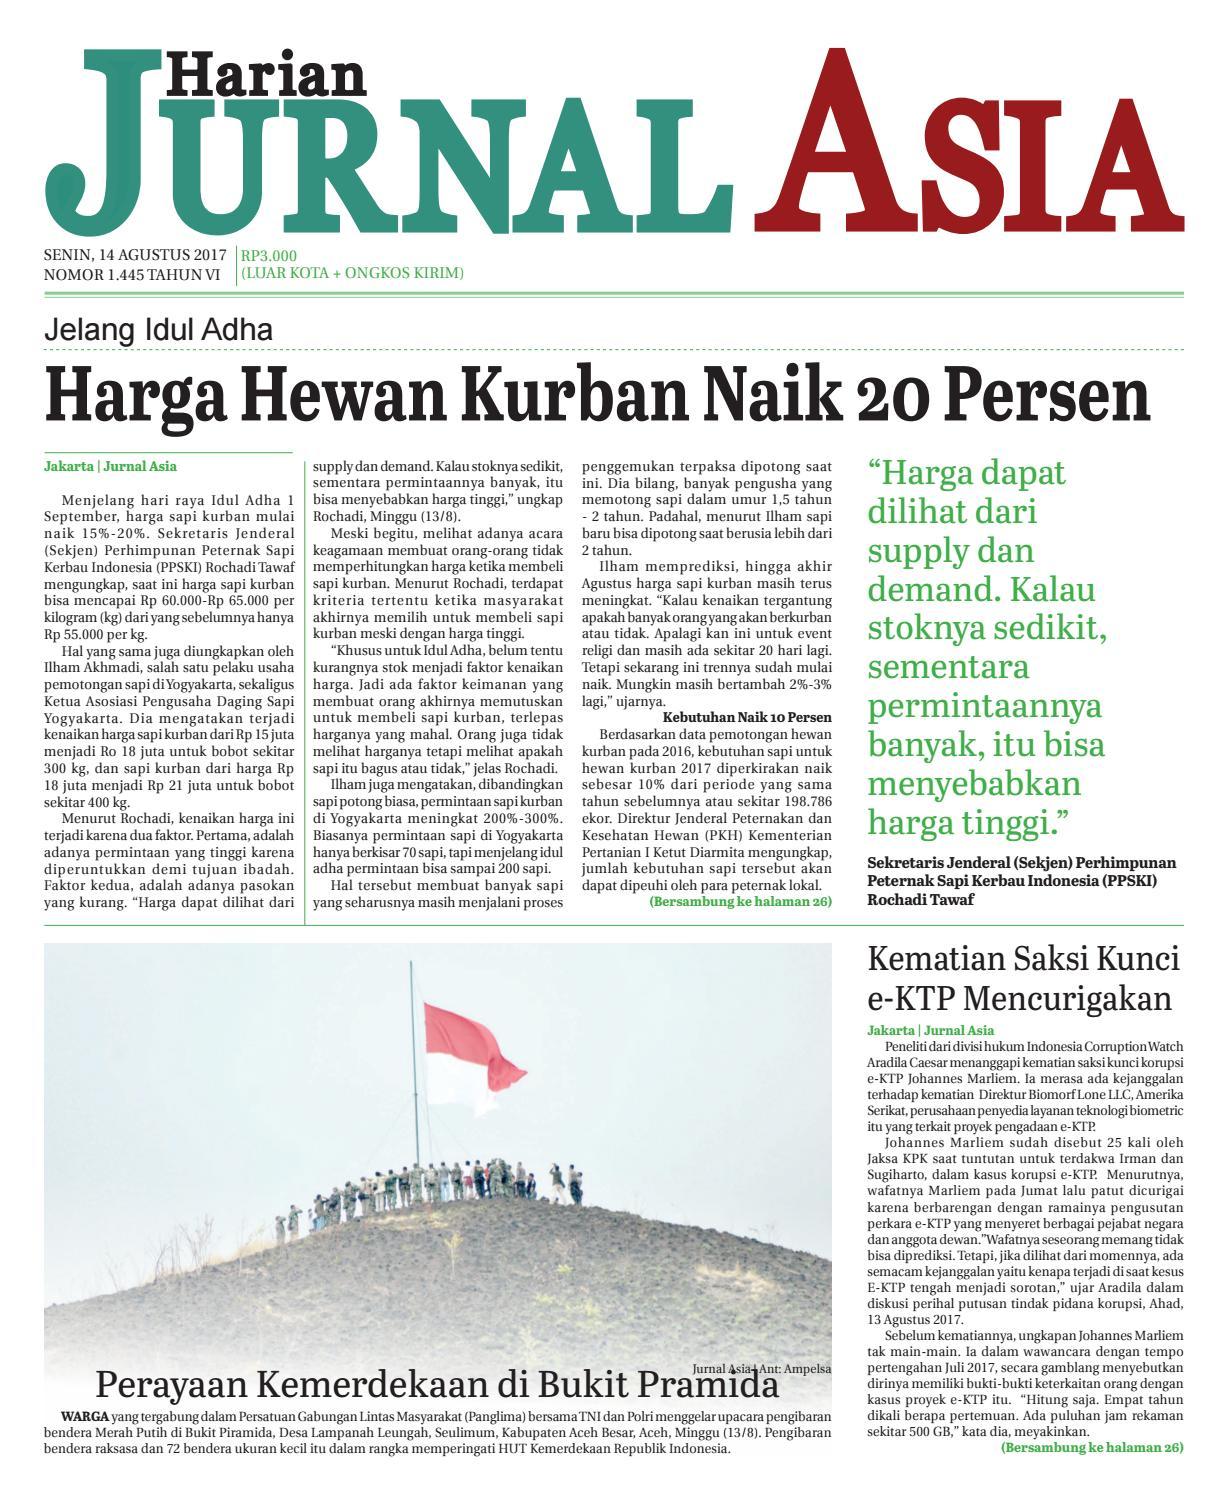 Harian Jurnal Asia Edisi Senin 14 Agustus 2017 By Produk Ukm Bumn Kain Batik Middle Premium 3 Bendera 01 Medan Issuu